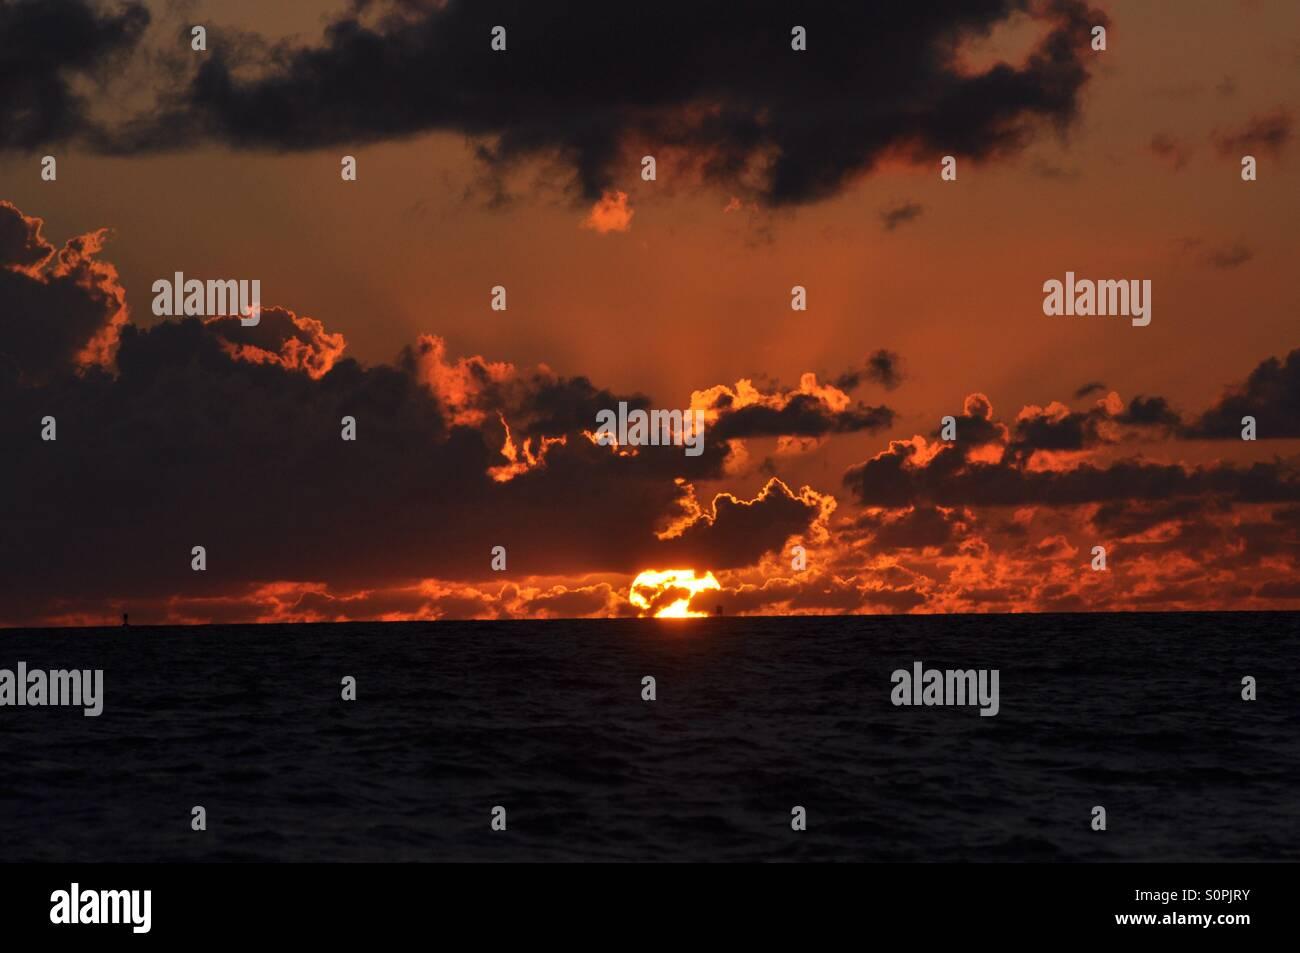 Red sun - Stock Image